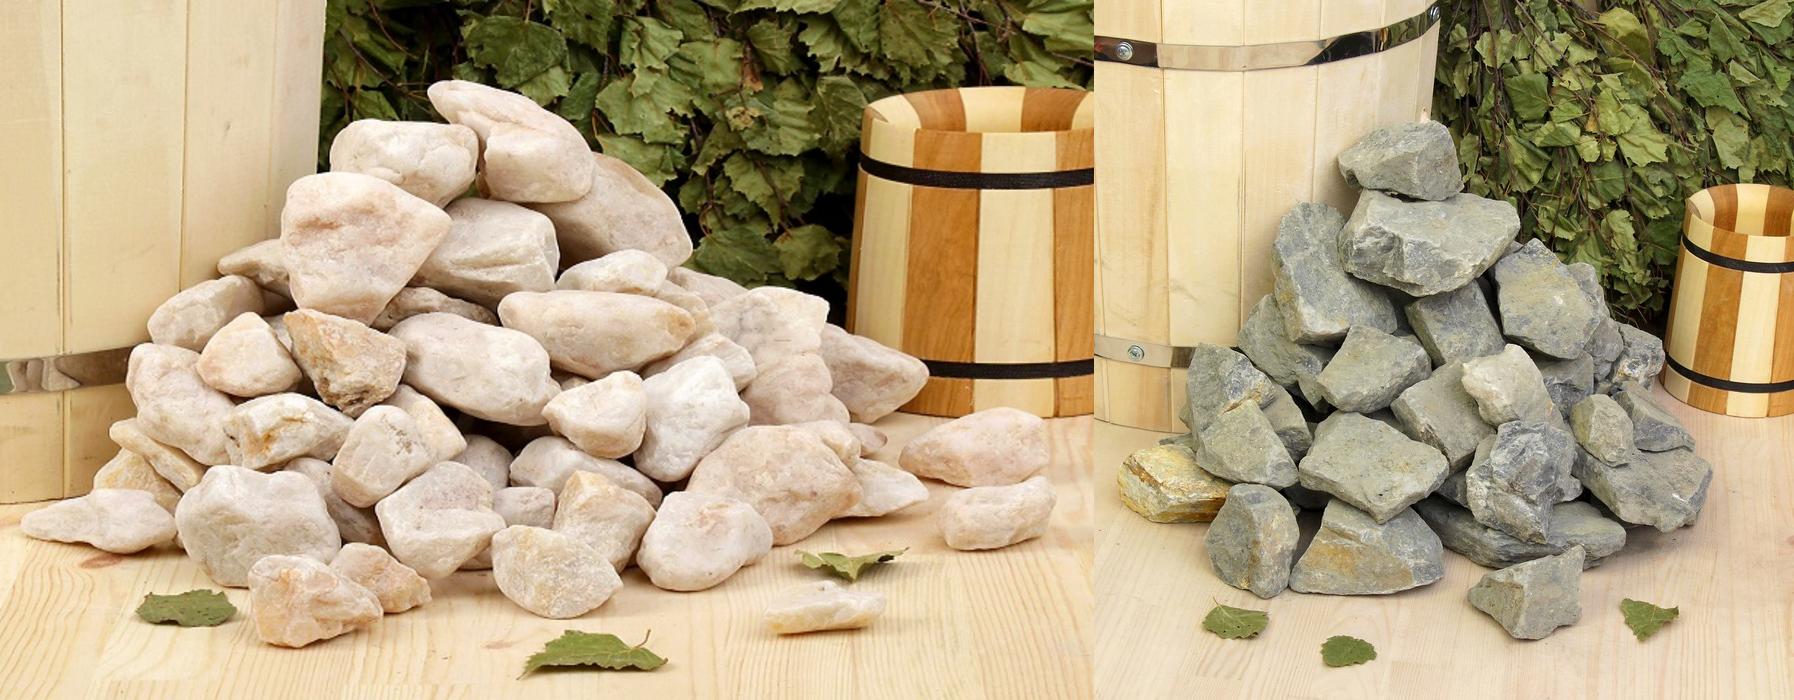 Виды каменок для бани